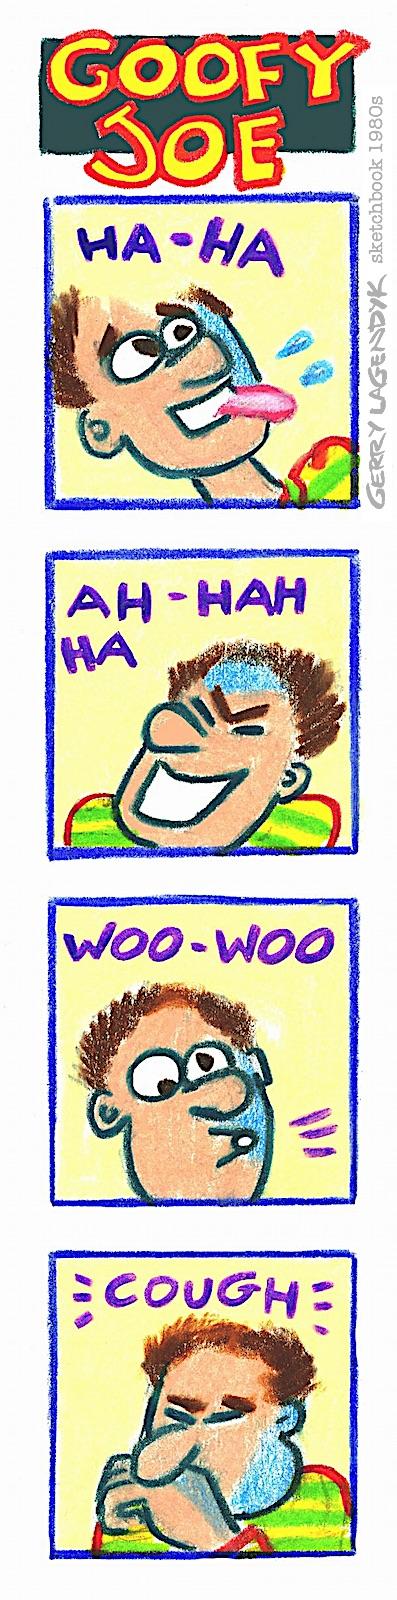 Goofy Joe, an auditioning cartoon character